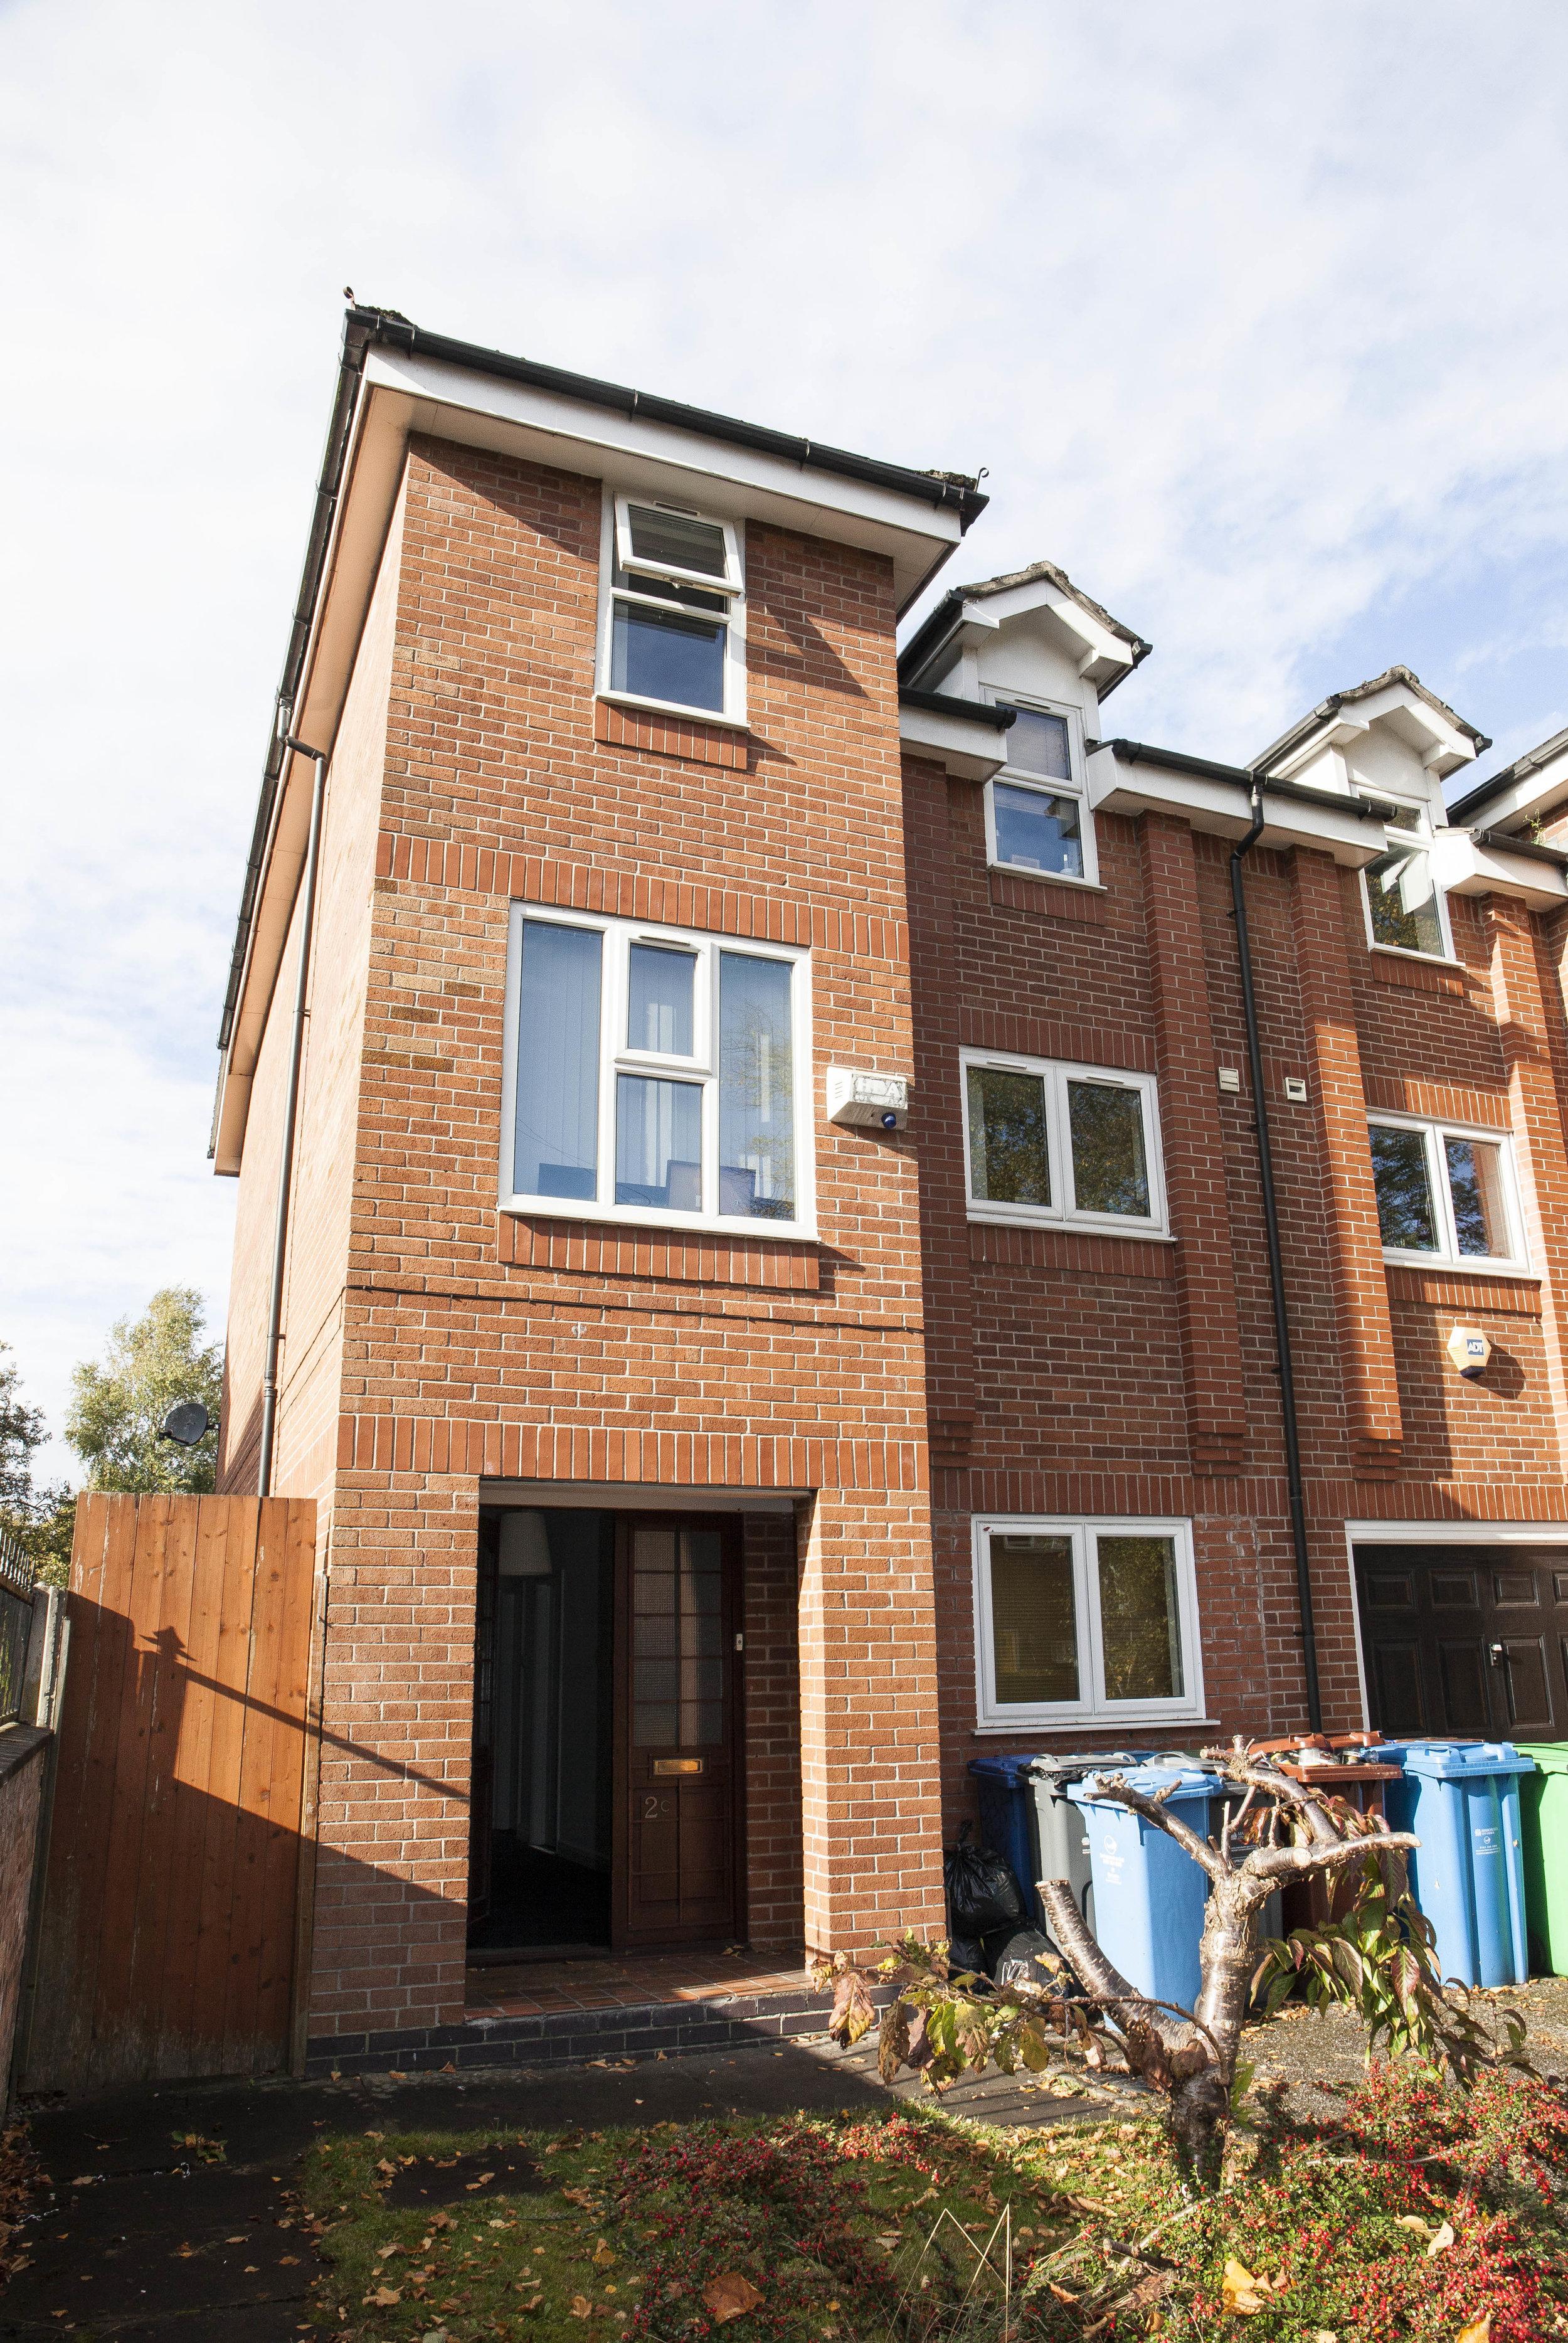 HOUSE C  Alan Road, Withington SORRY, ALREADY LET